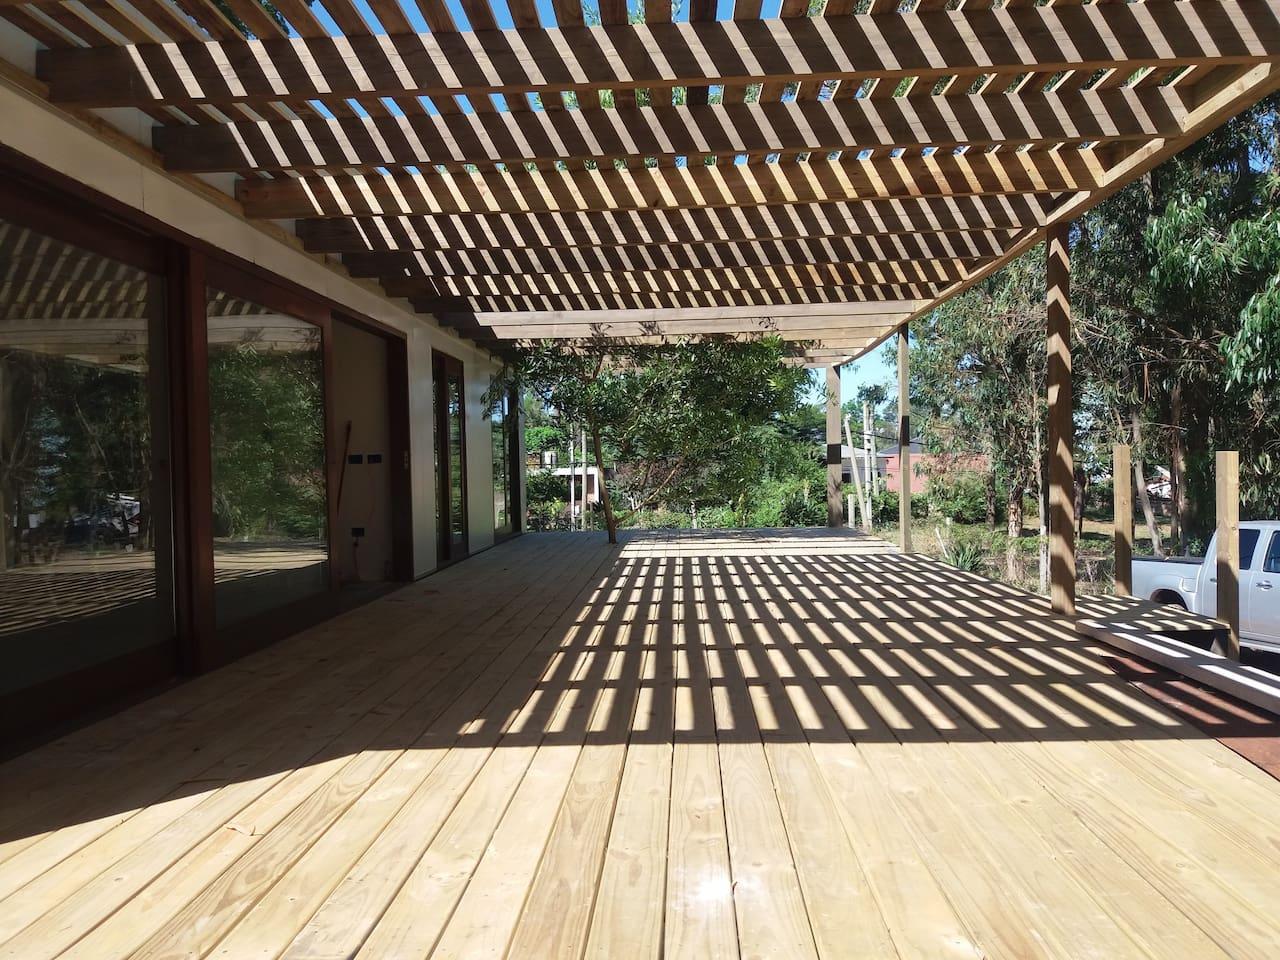 Amplió deck 12 mts x 4.5mts